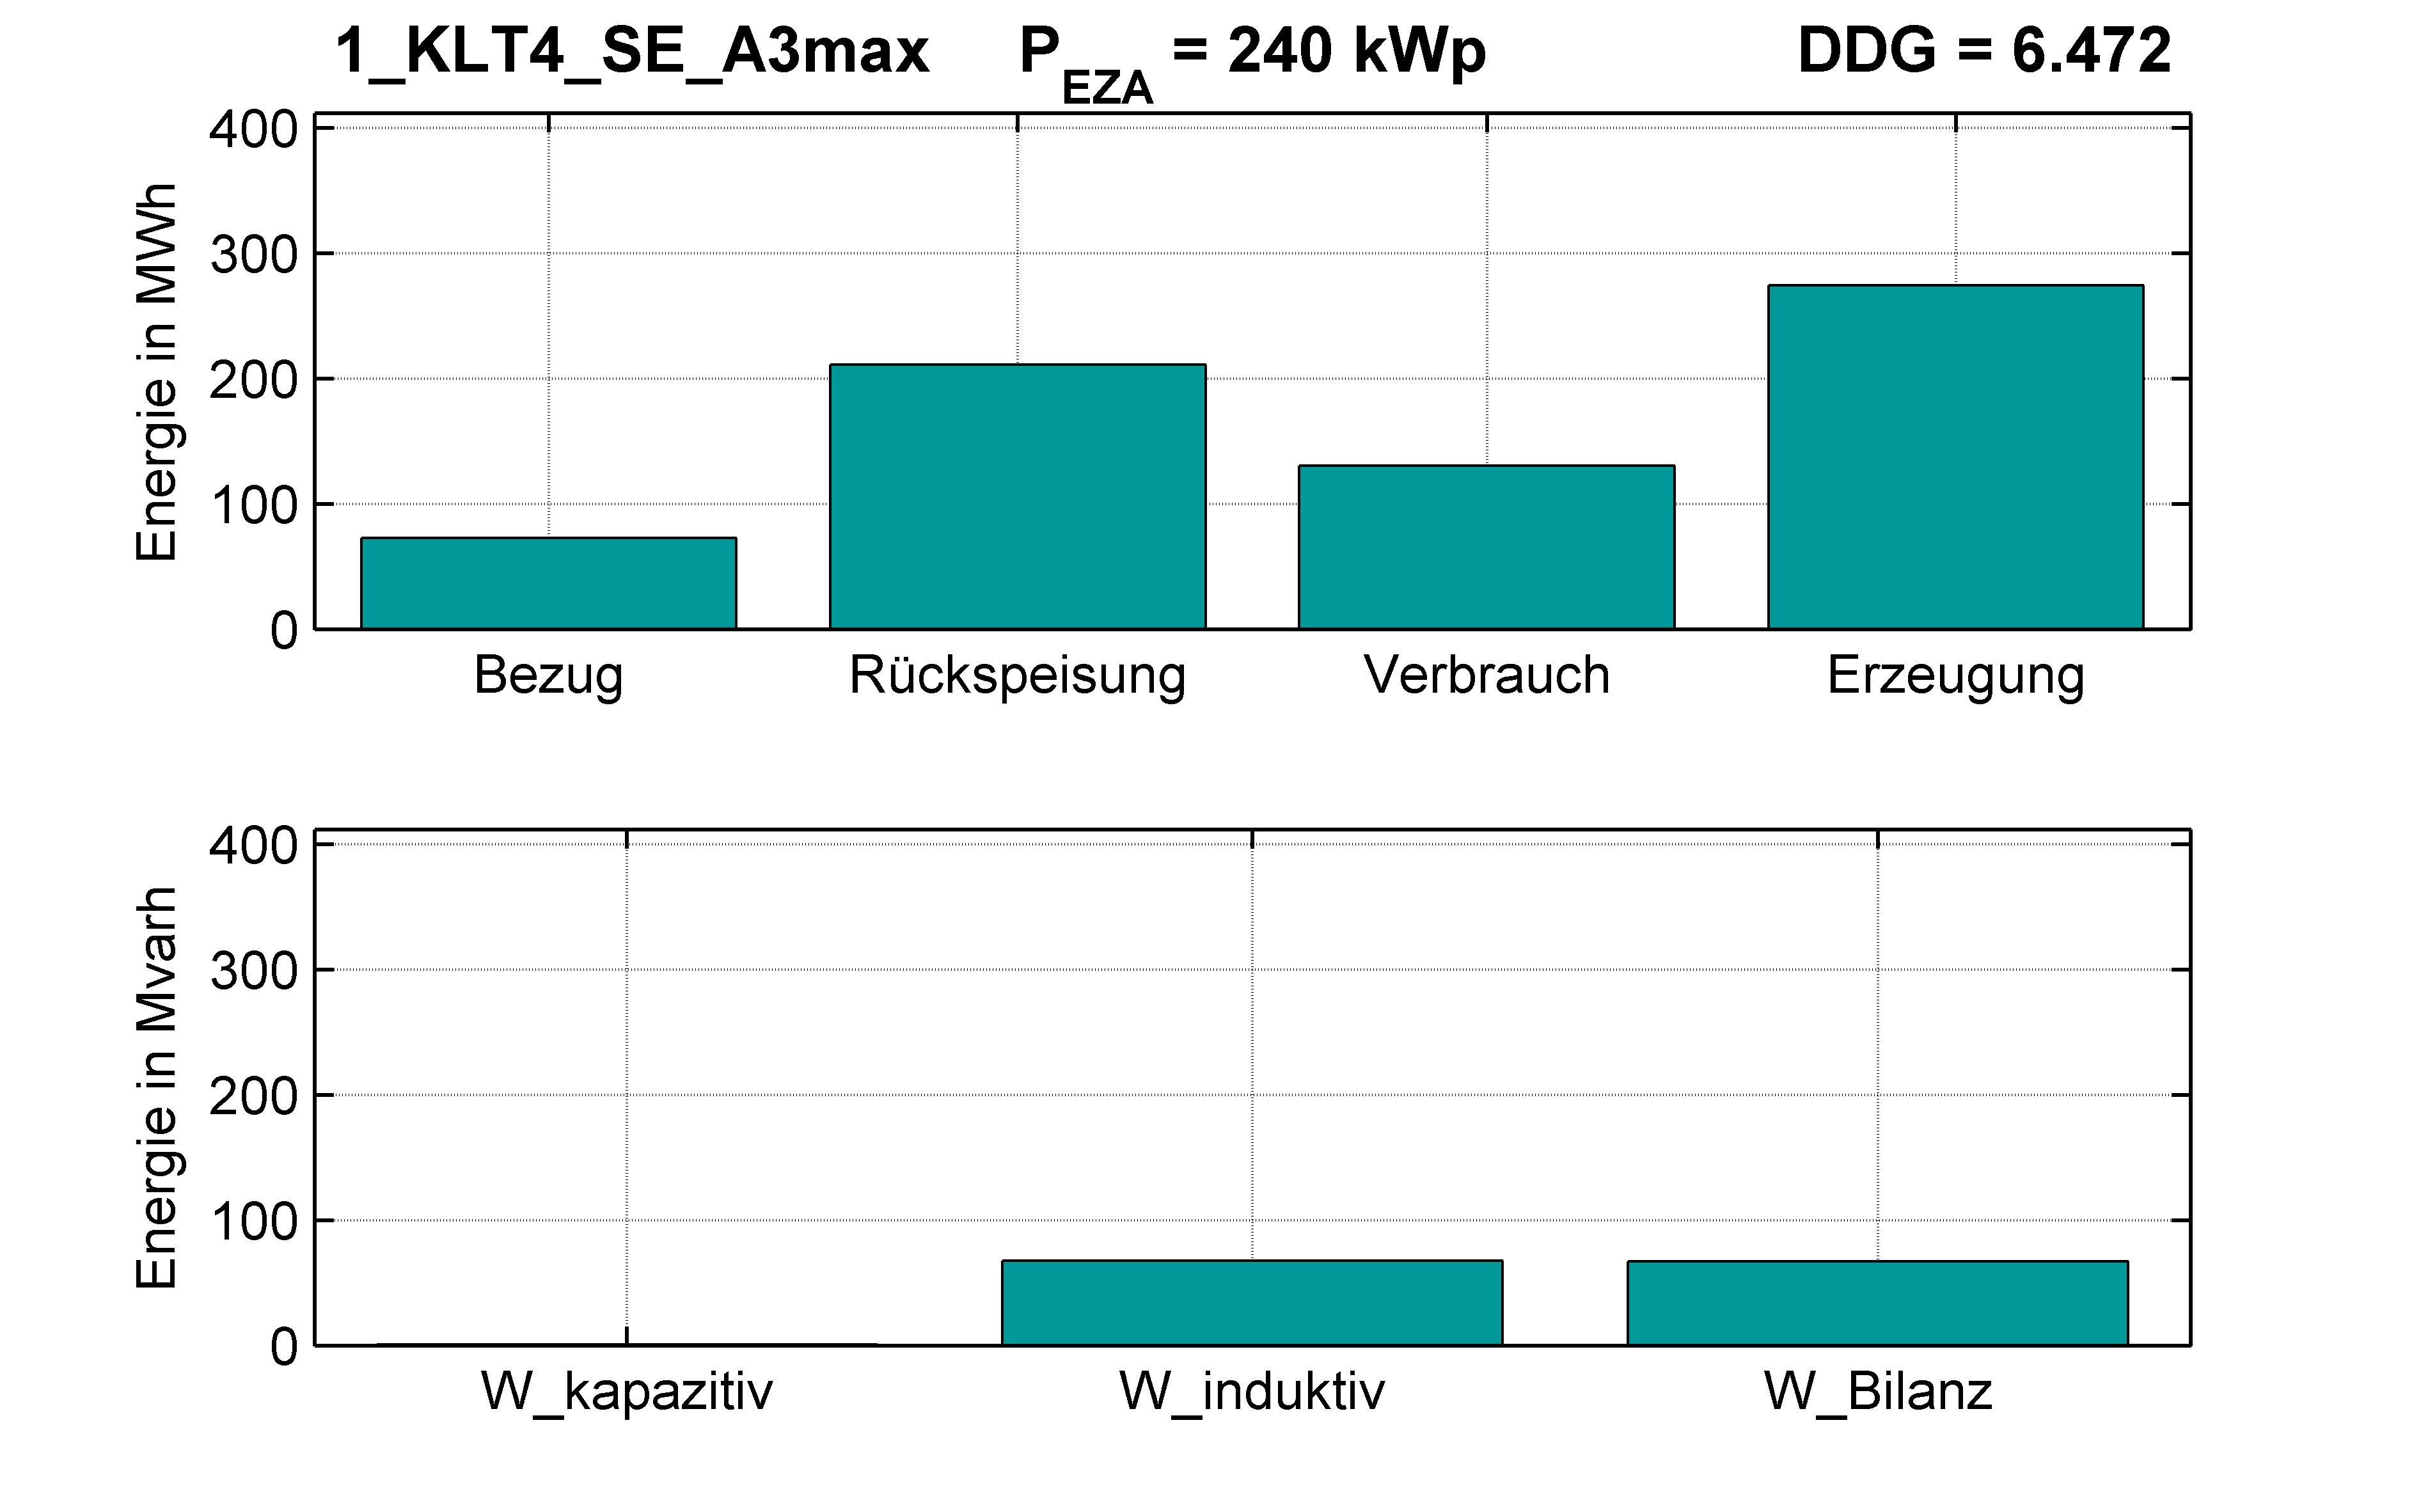 KLT4 | KABEL (SE) A3max | PQ-Bilanz